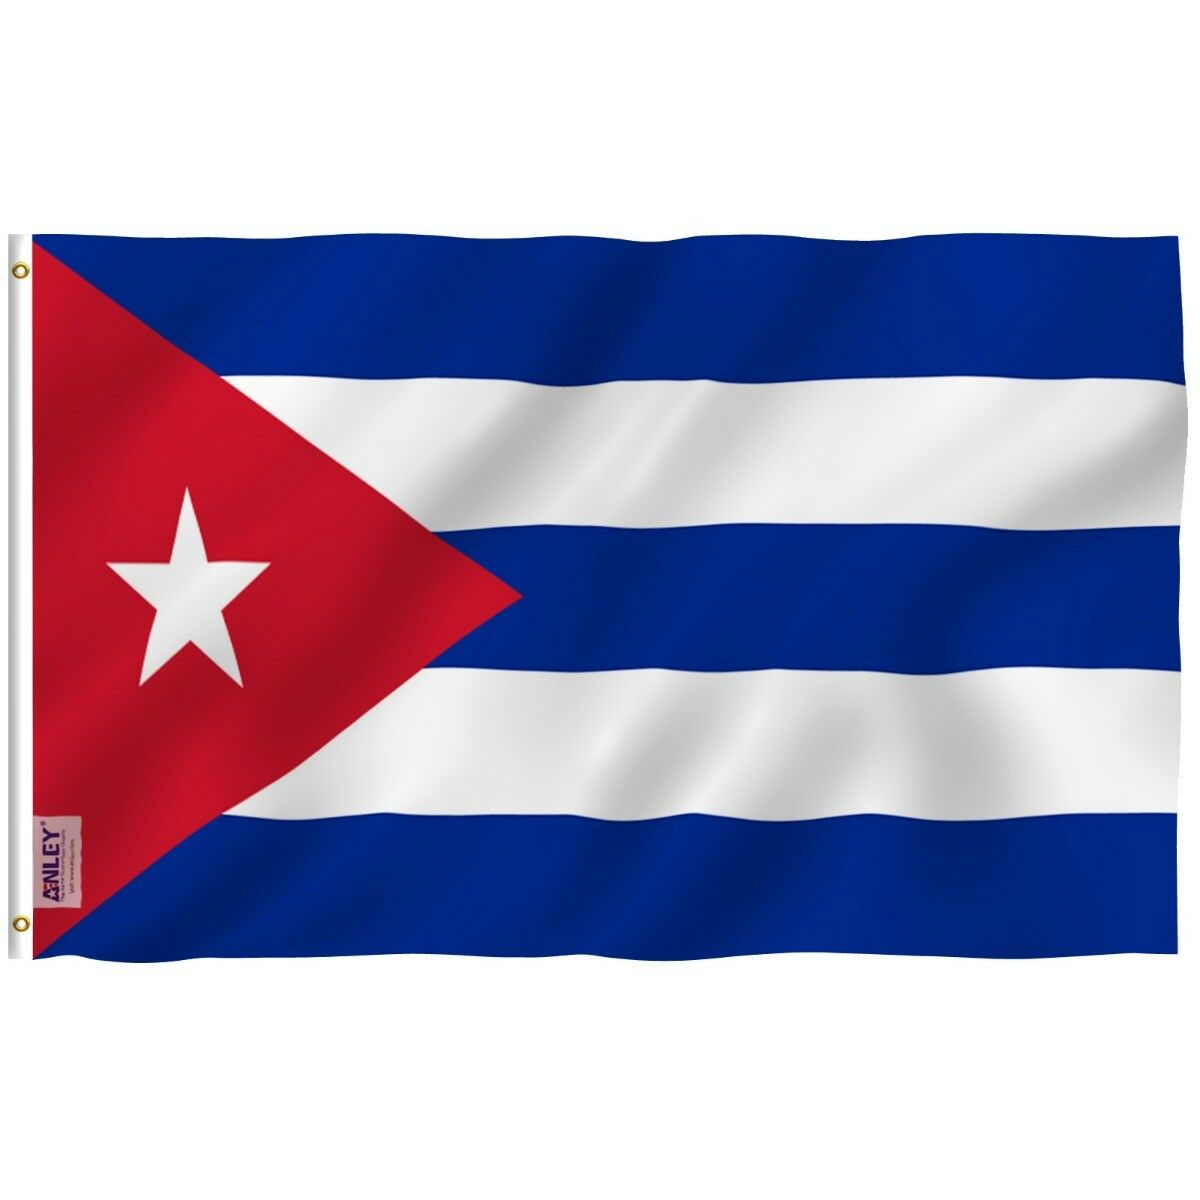 Anley Fly Breeze 3x5 Foot Cuba Flag Cuban National Flags Pol